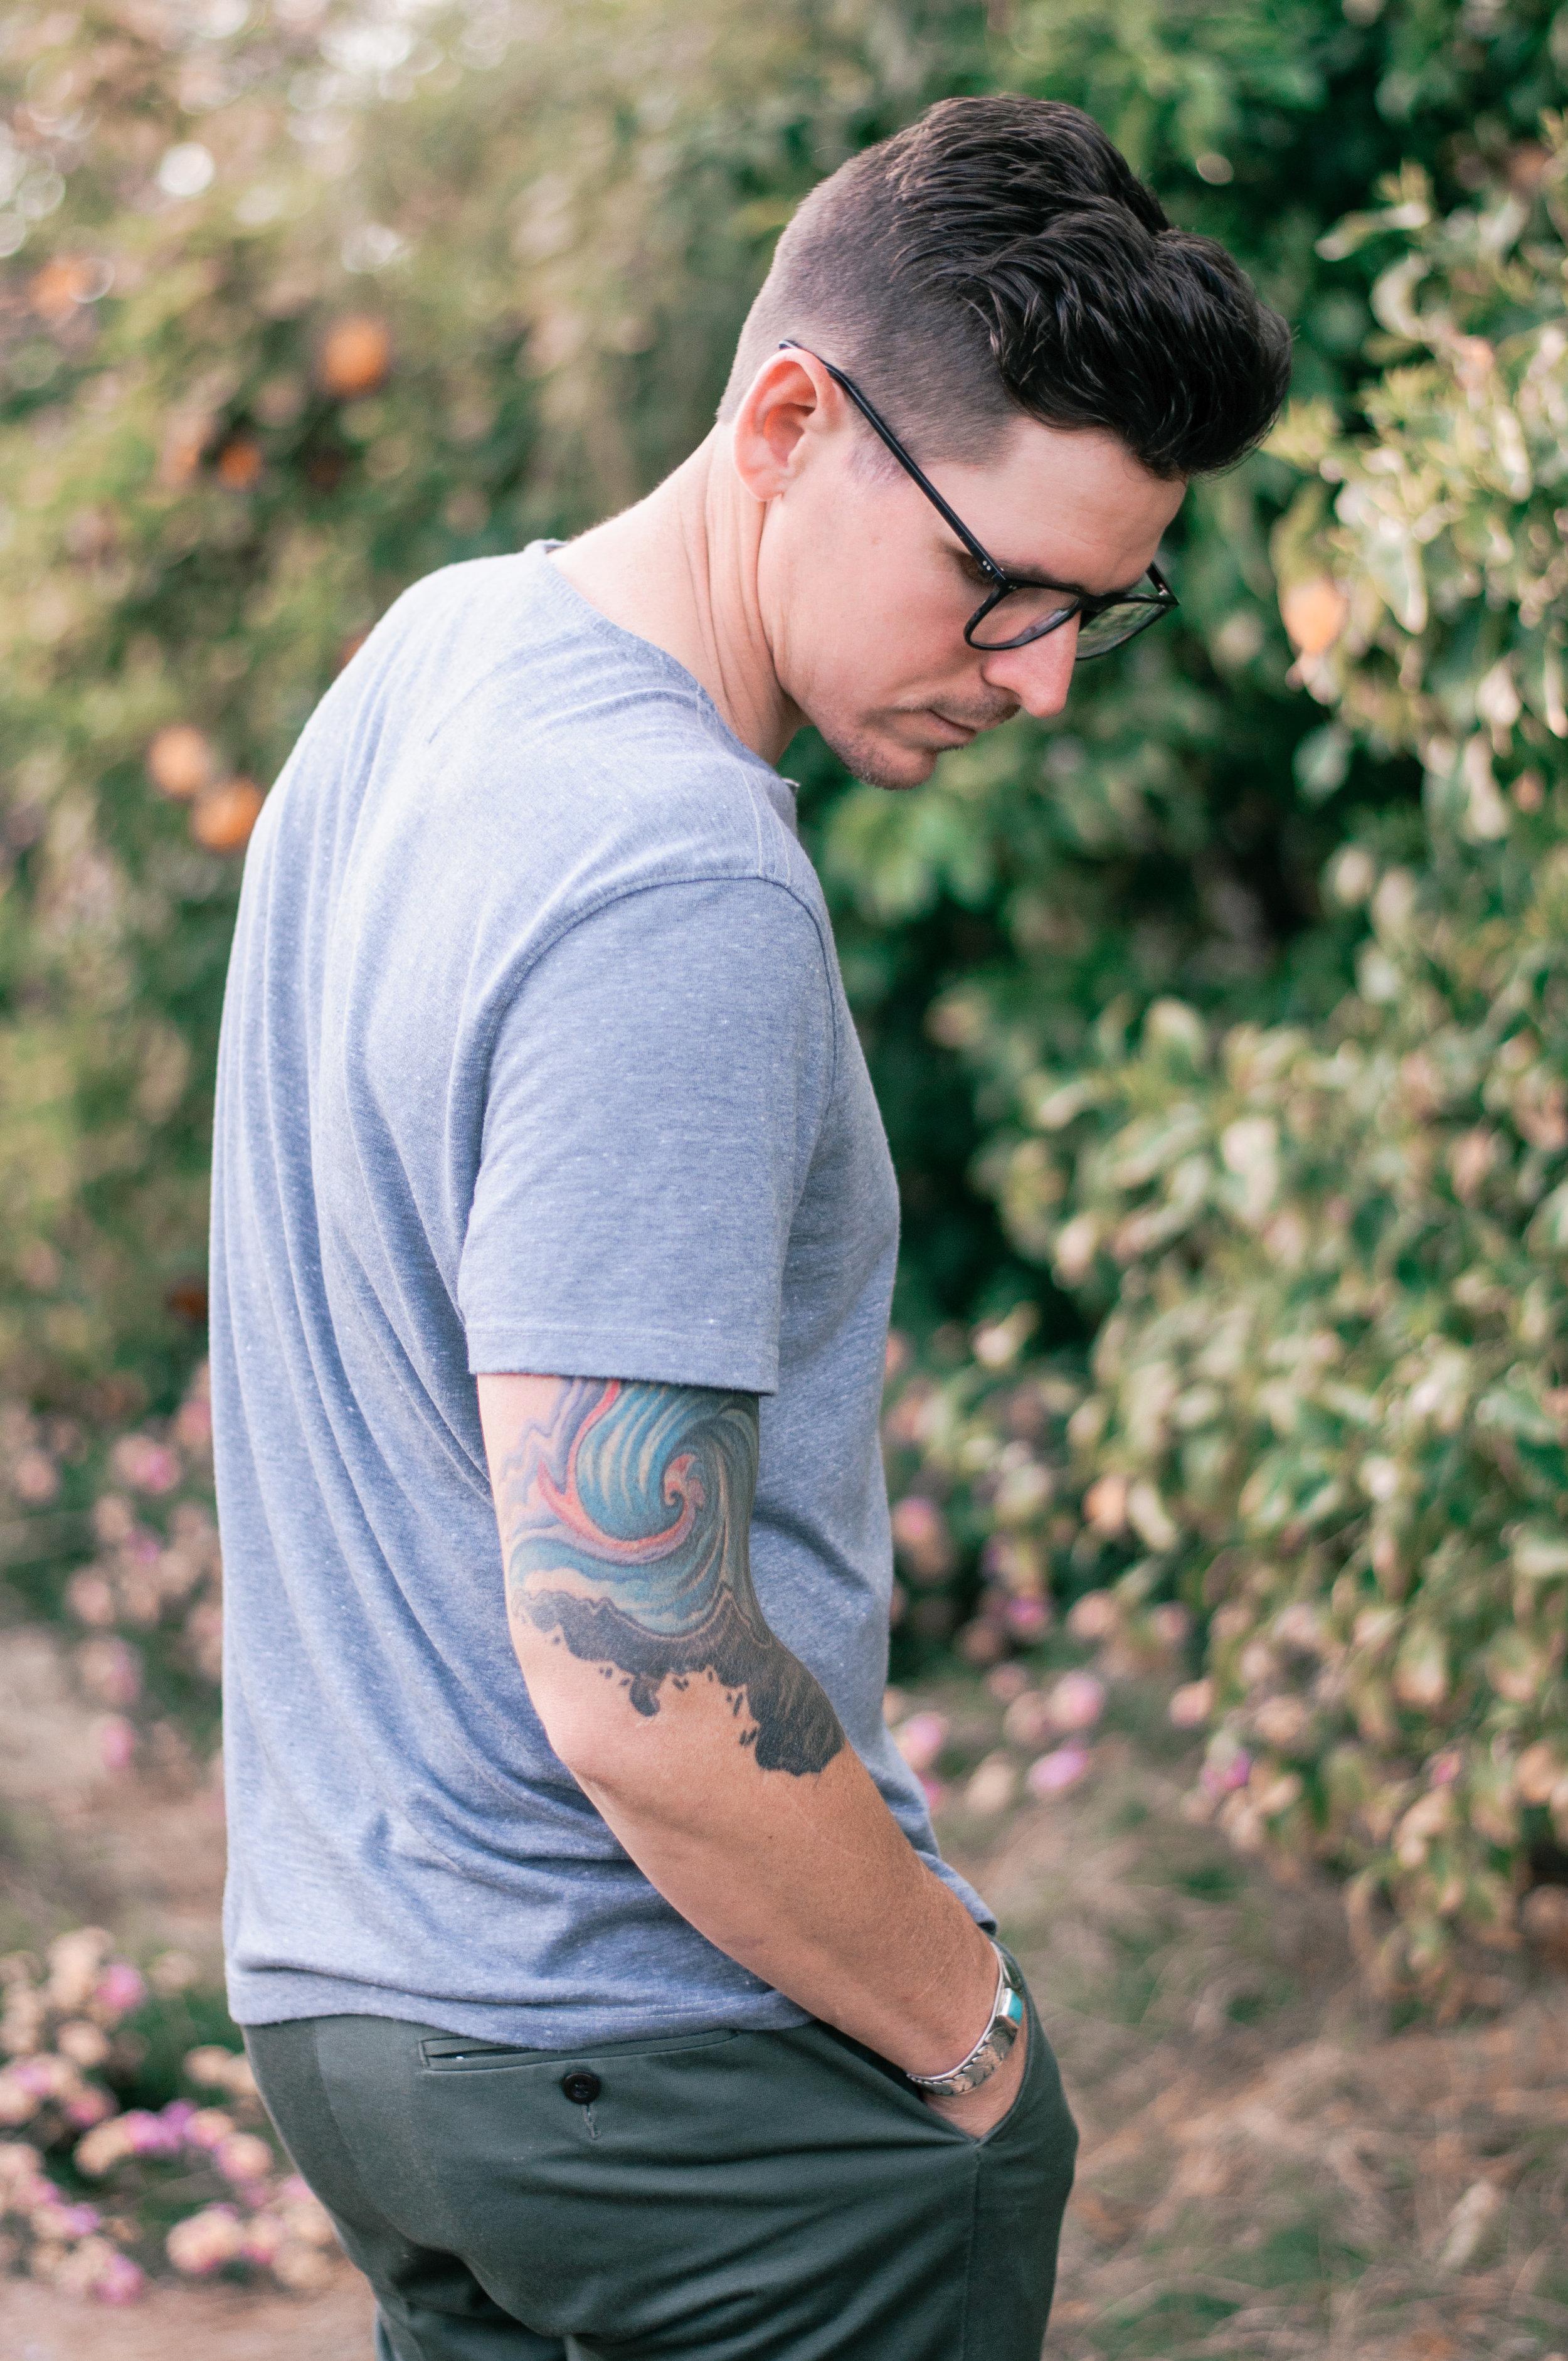 Men's EyeBuyDirect Exposure Eyeglasses in Jet Black